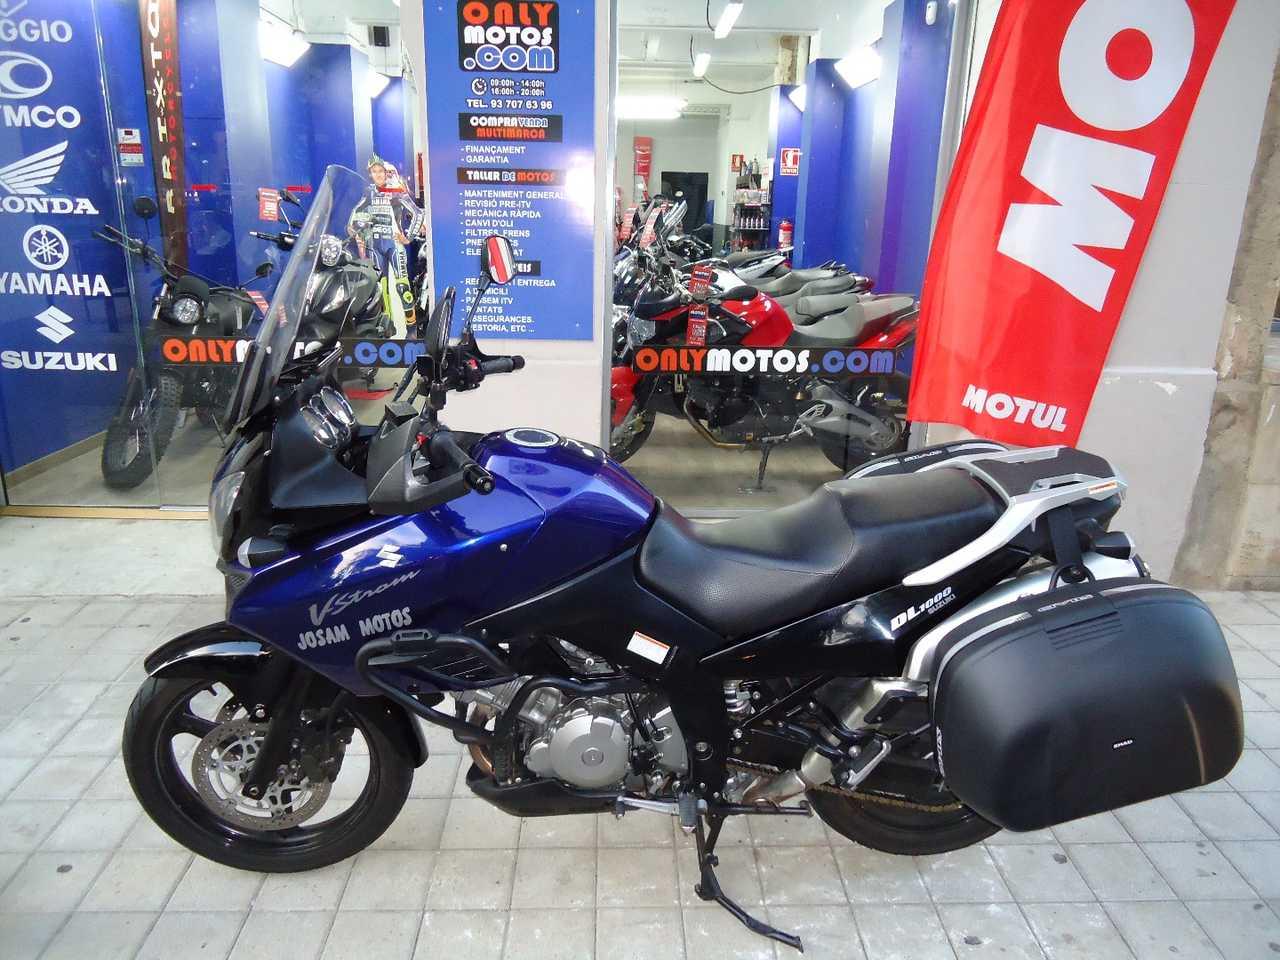 Suzuki V-Strom 1000   - Foto 1